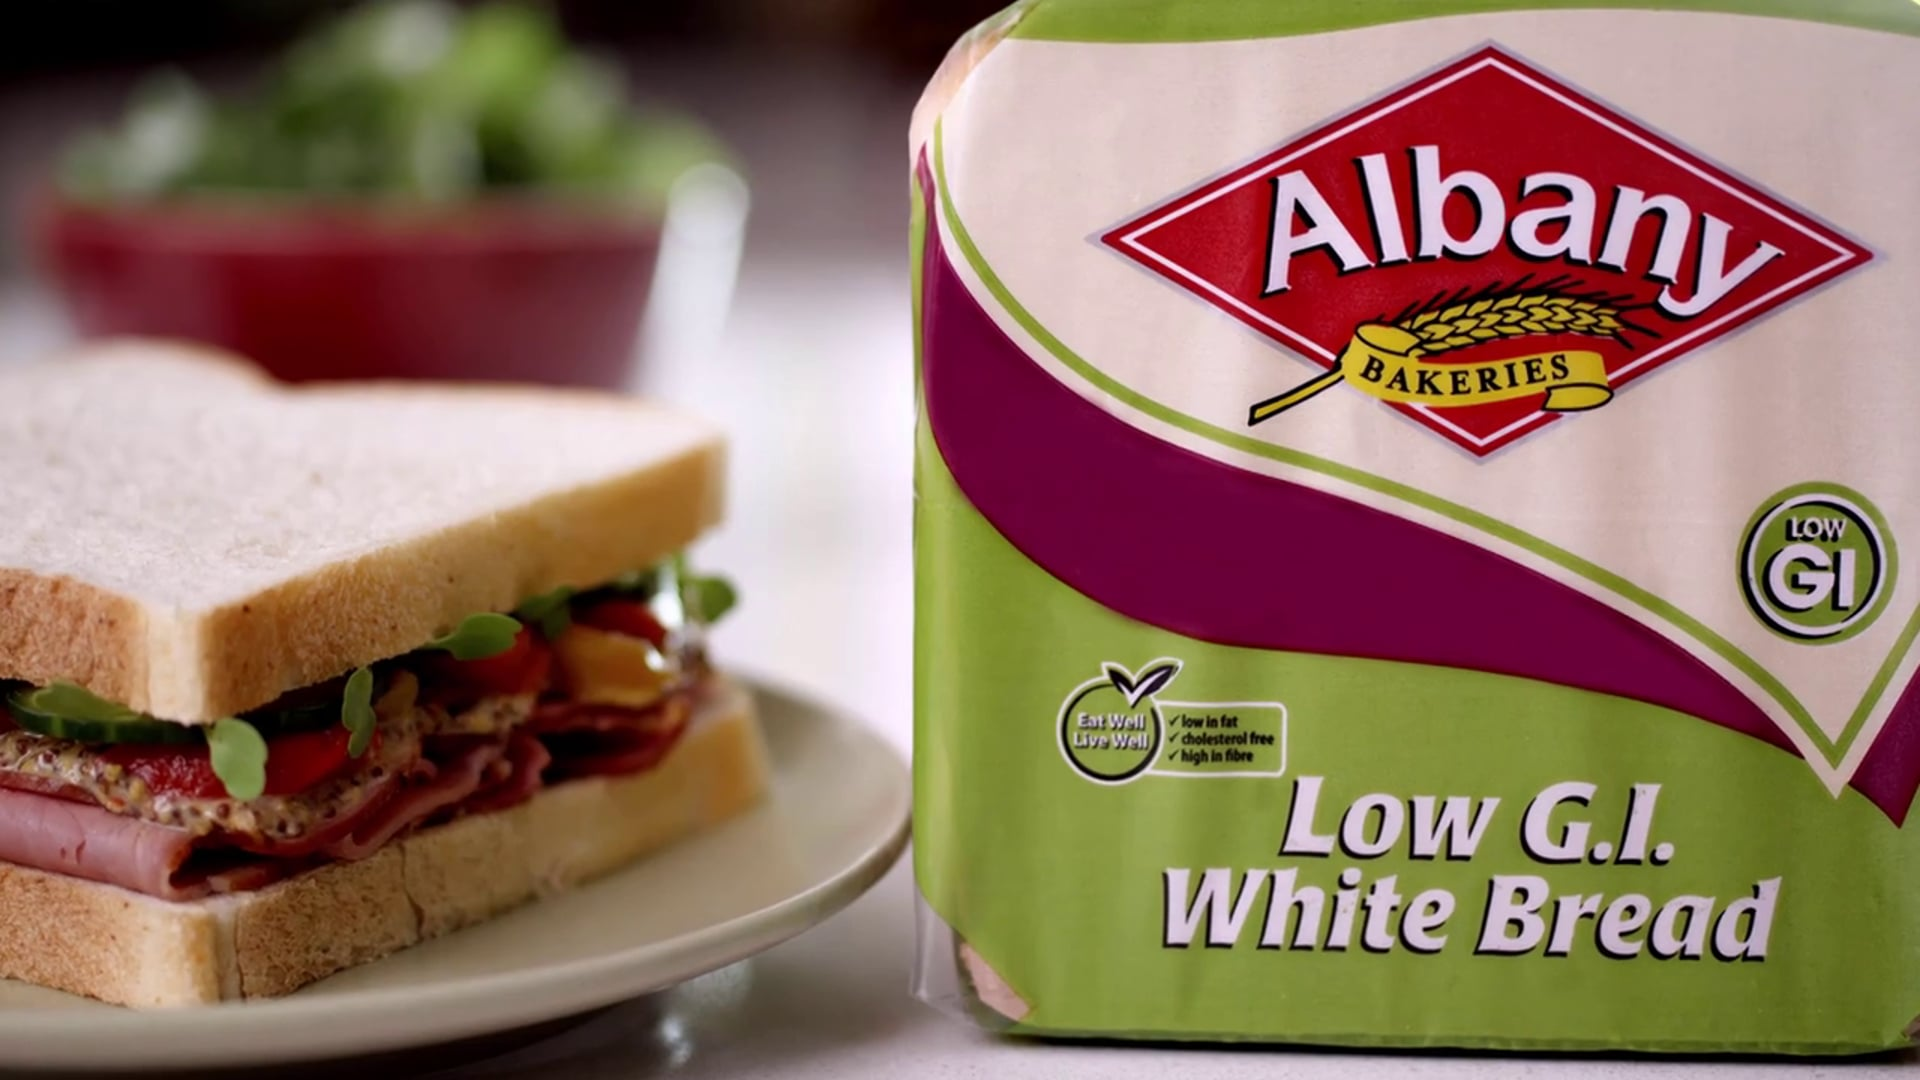 Buy Smart - ALBANY LOW GI WITH REDI TLHABI